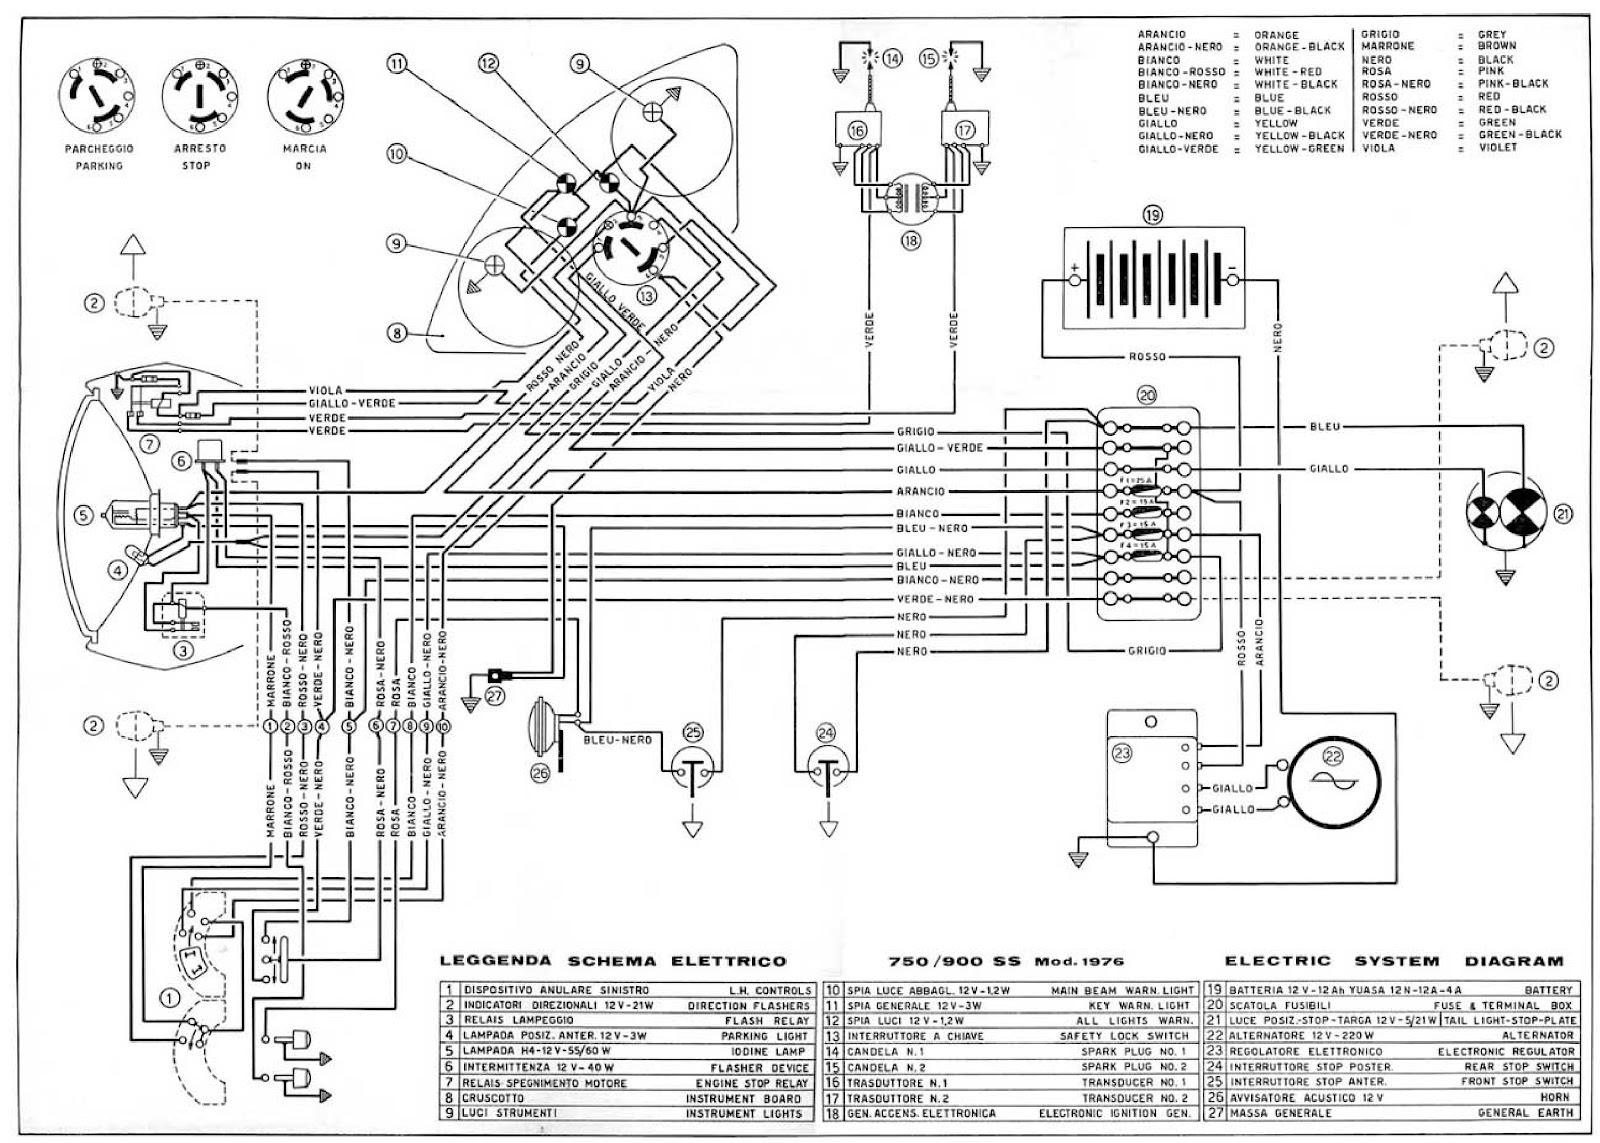 ducati monster 900 wiring 1995 use wiring diagram ducati evo 1100 wiring diagram wiring diagram blog [ 1600 x 1143 Pixel ]